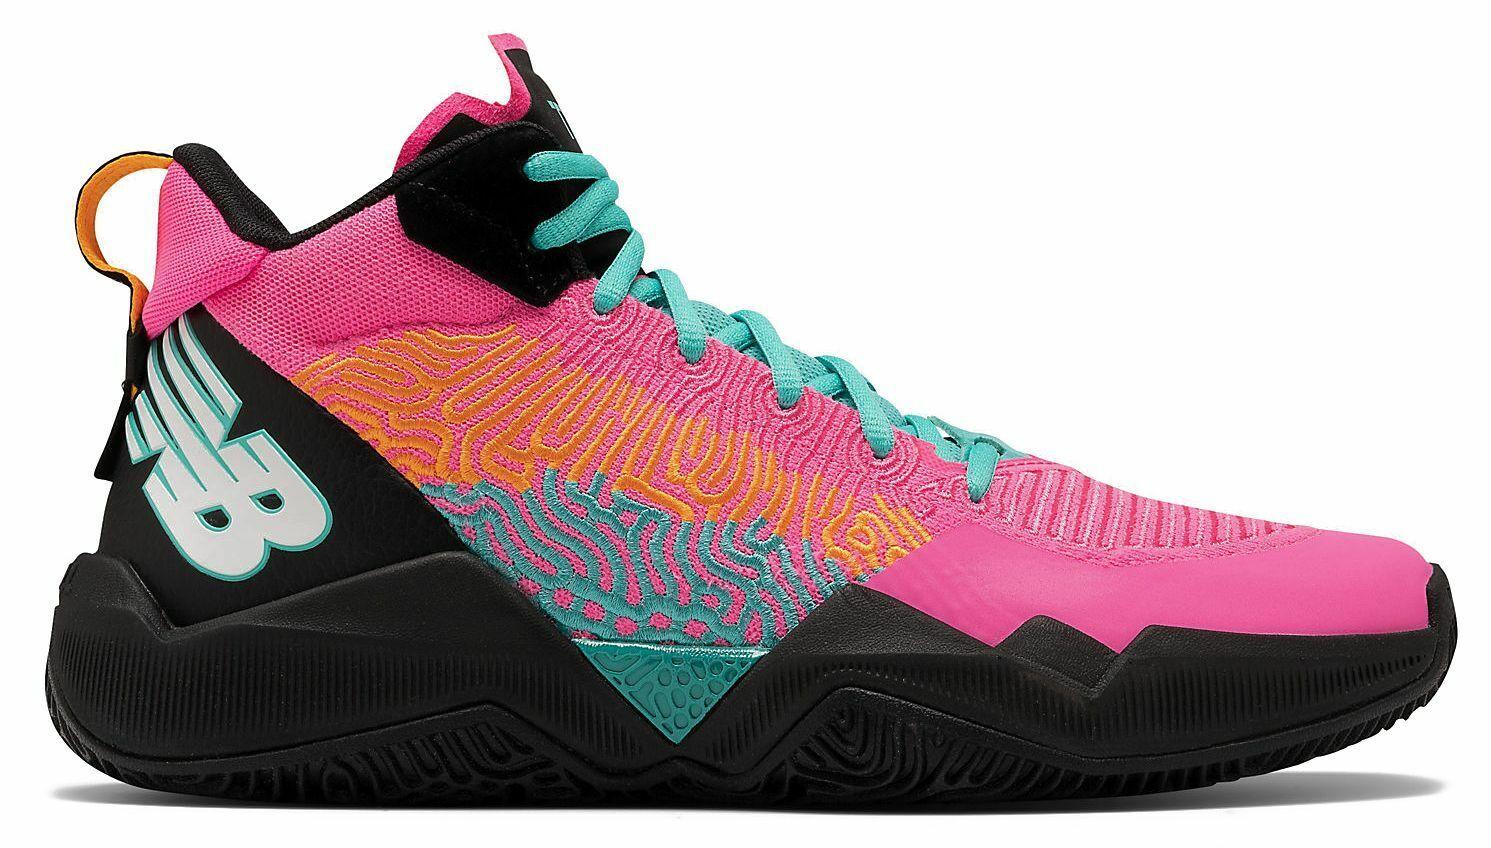 New balance shoes dejounte murray two wxy light peony black